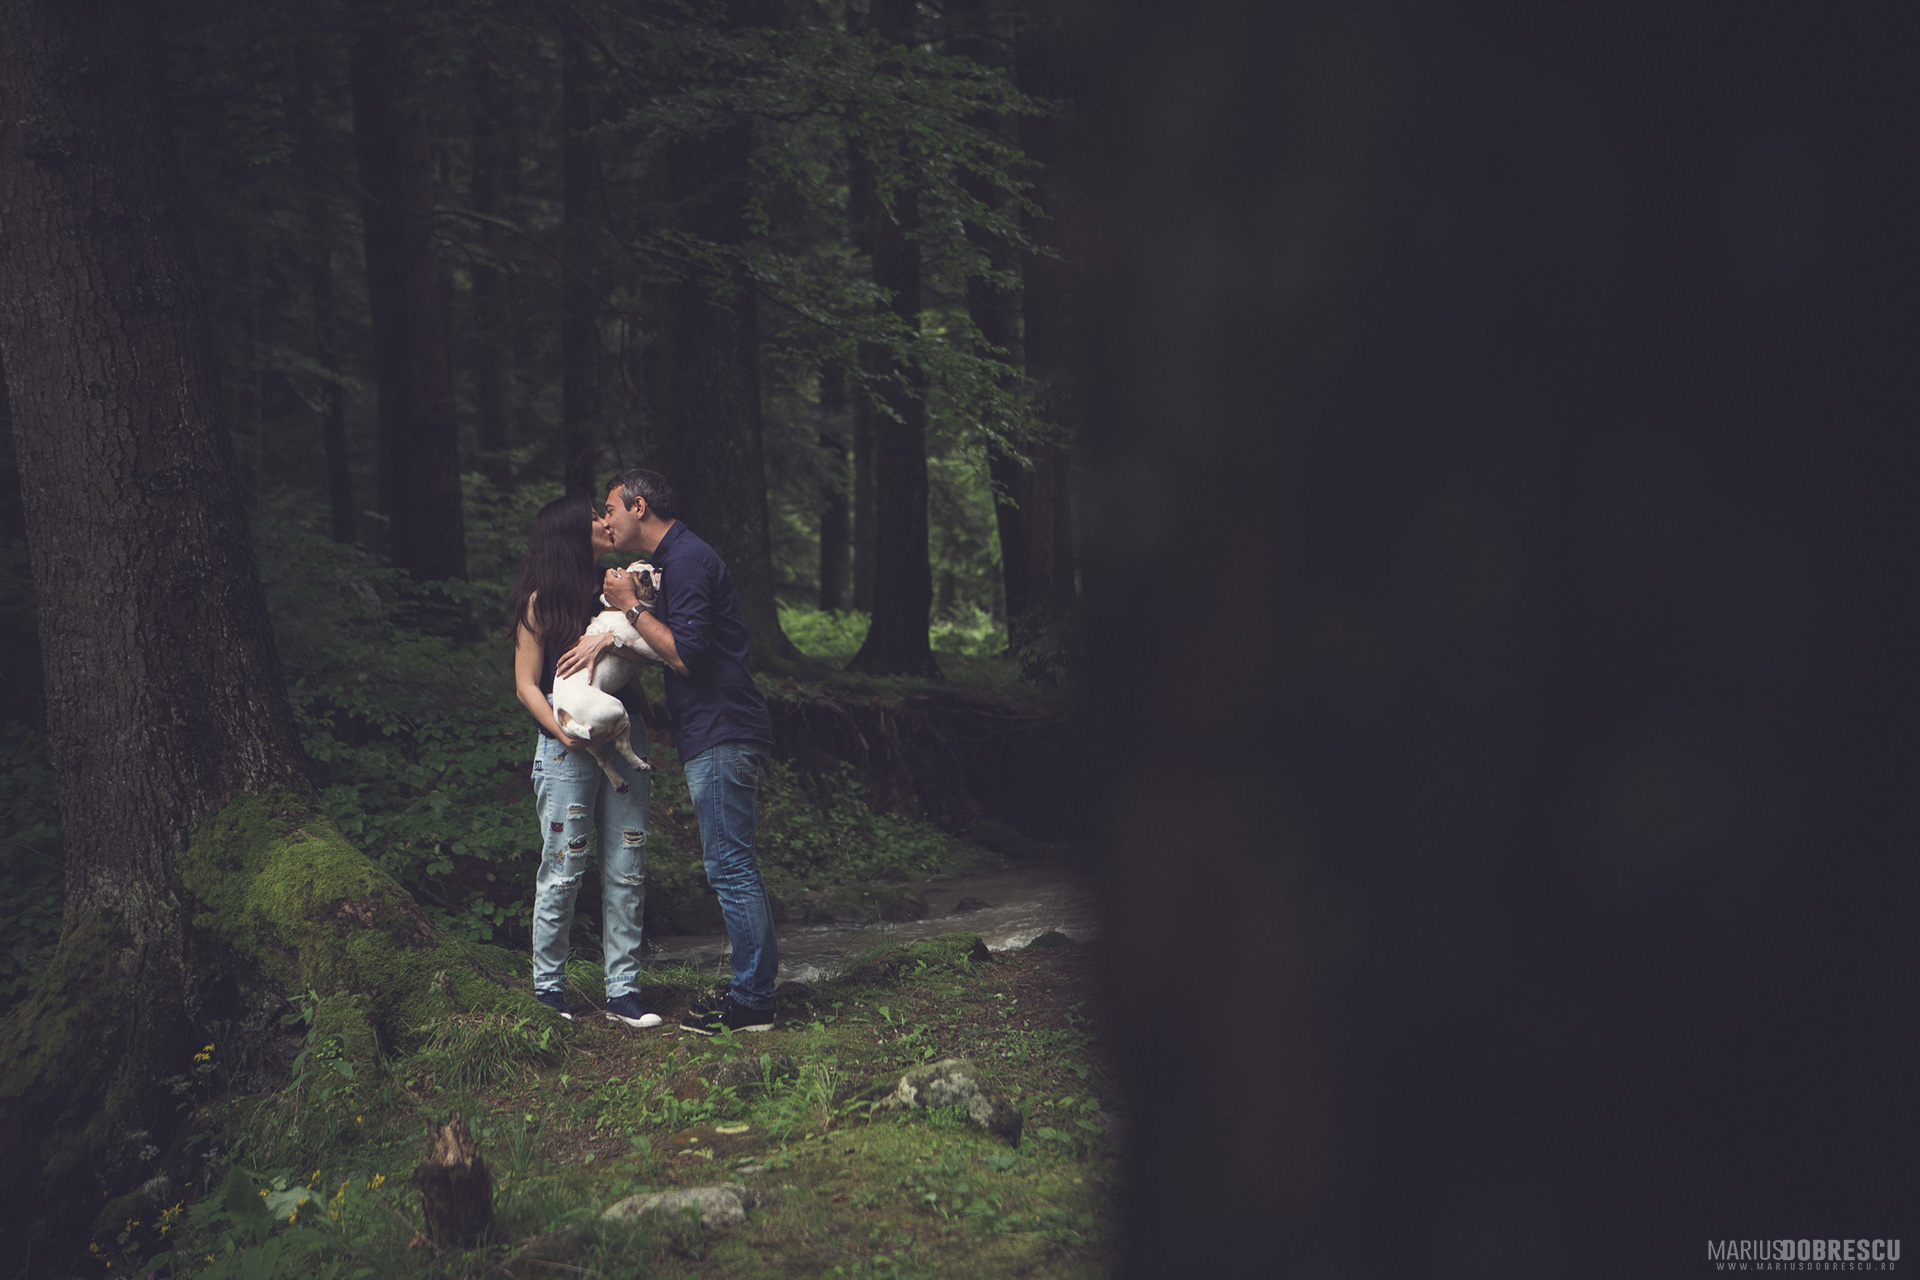 Alexandra & Adrain - Save the Date, Cheia | Marius Dobrescu - Fotograf nunta